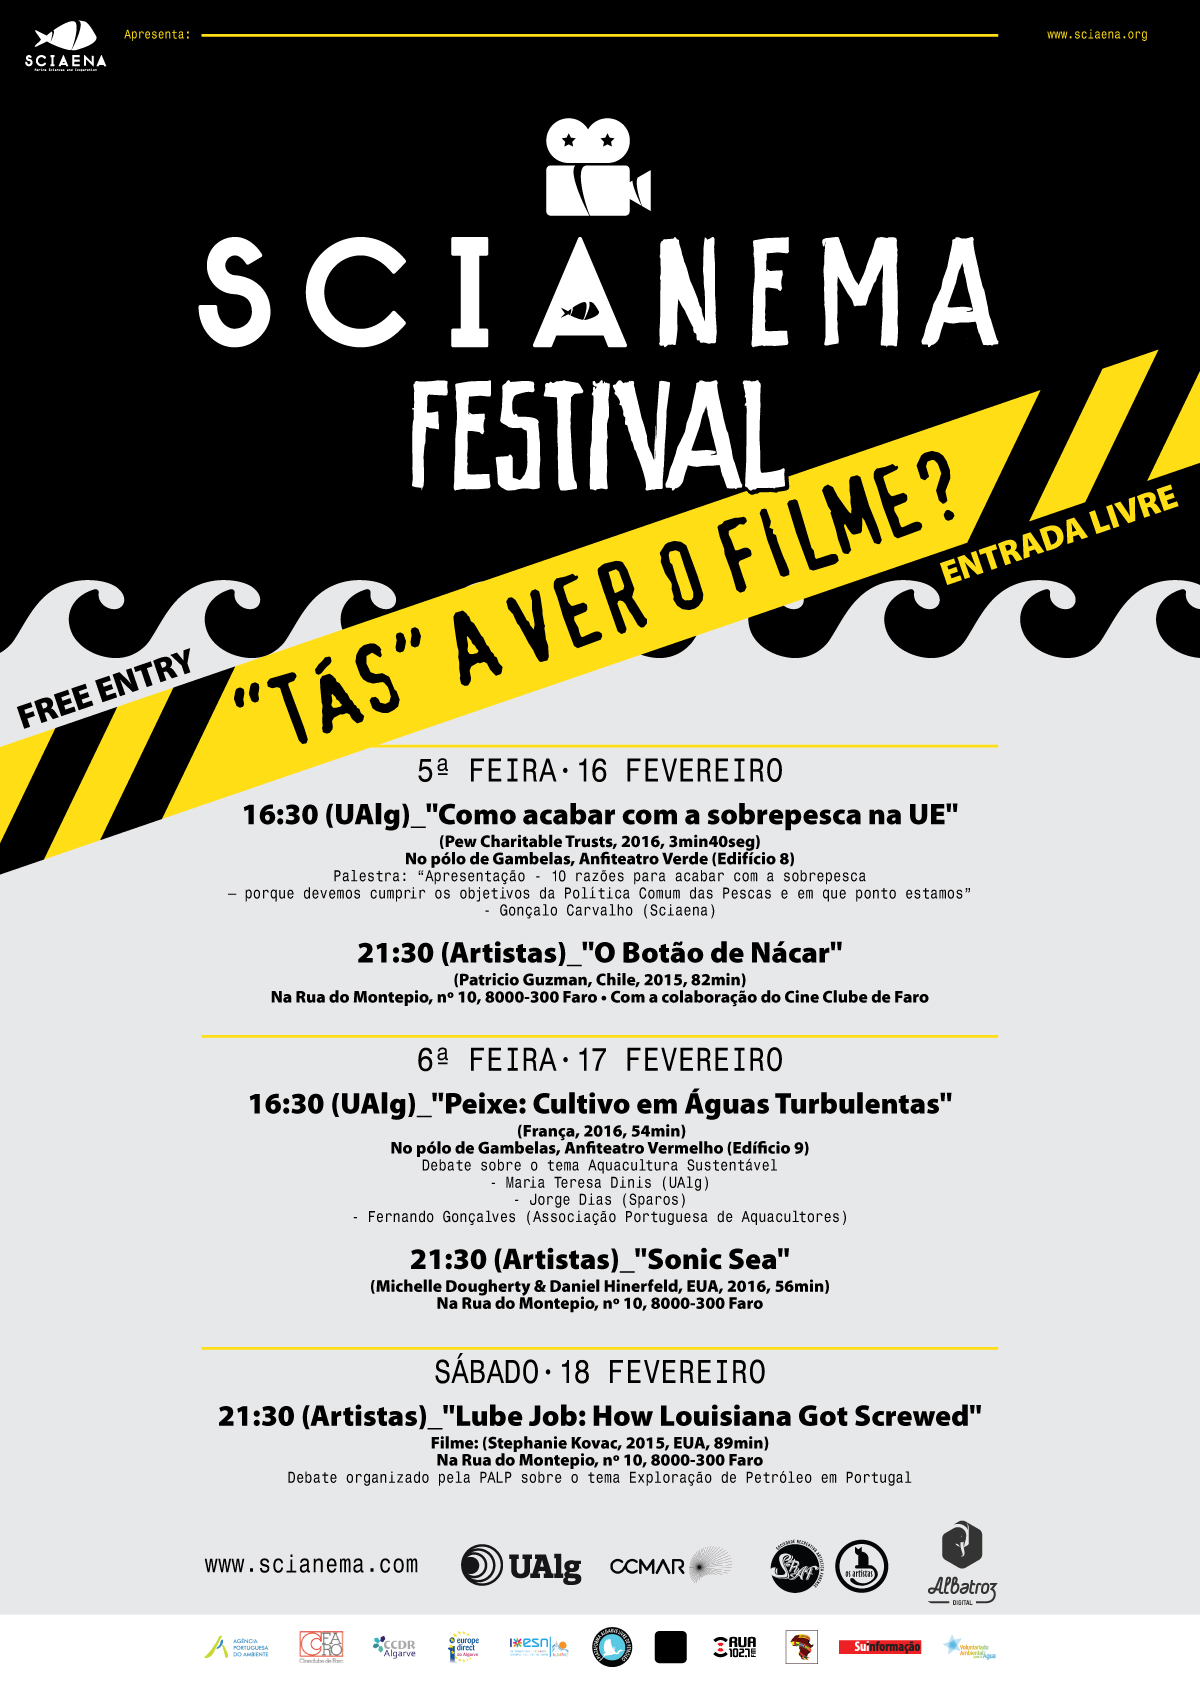 scianema_festival-cartaz-17